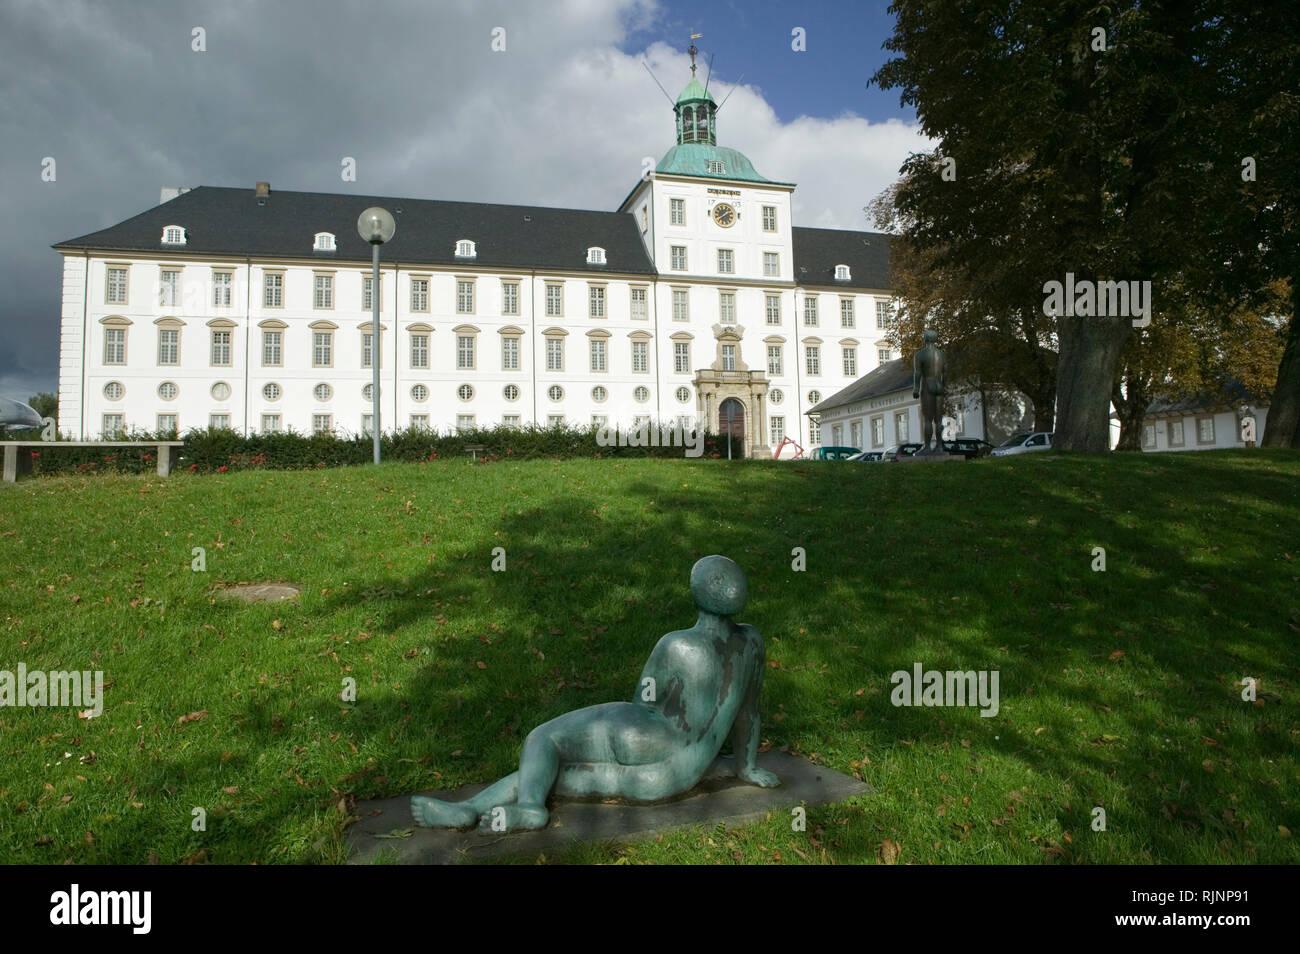 Gottorf Palace, Schleswig, Schleswig-Holstein, Northern Germany, Germany, Europe - Stock Image